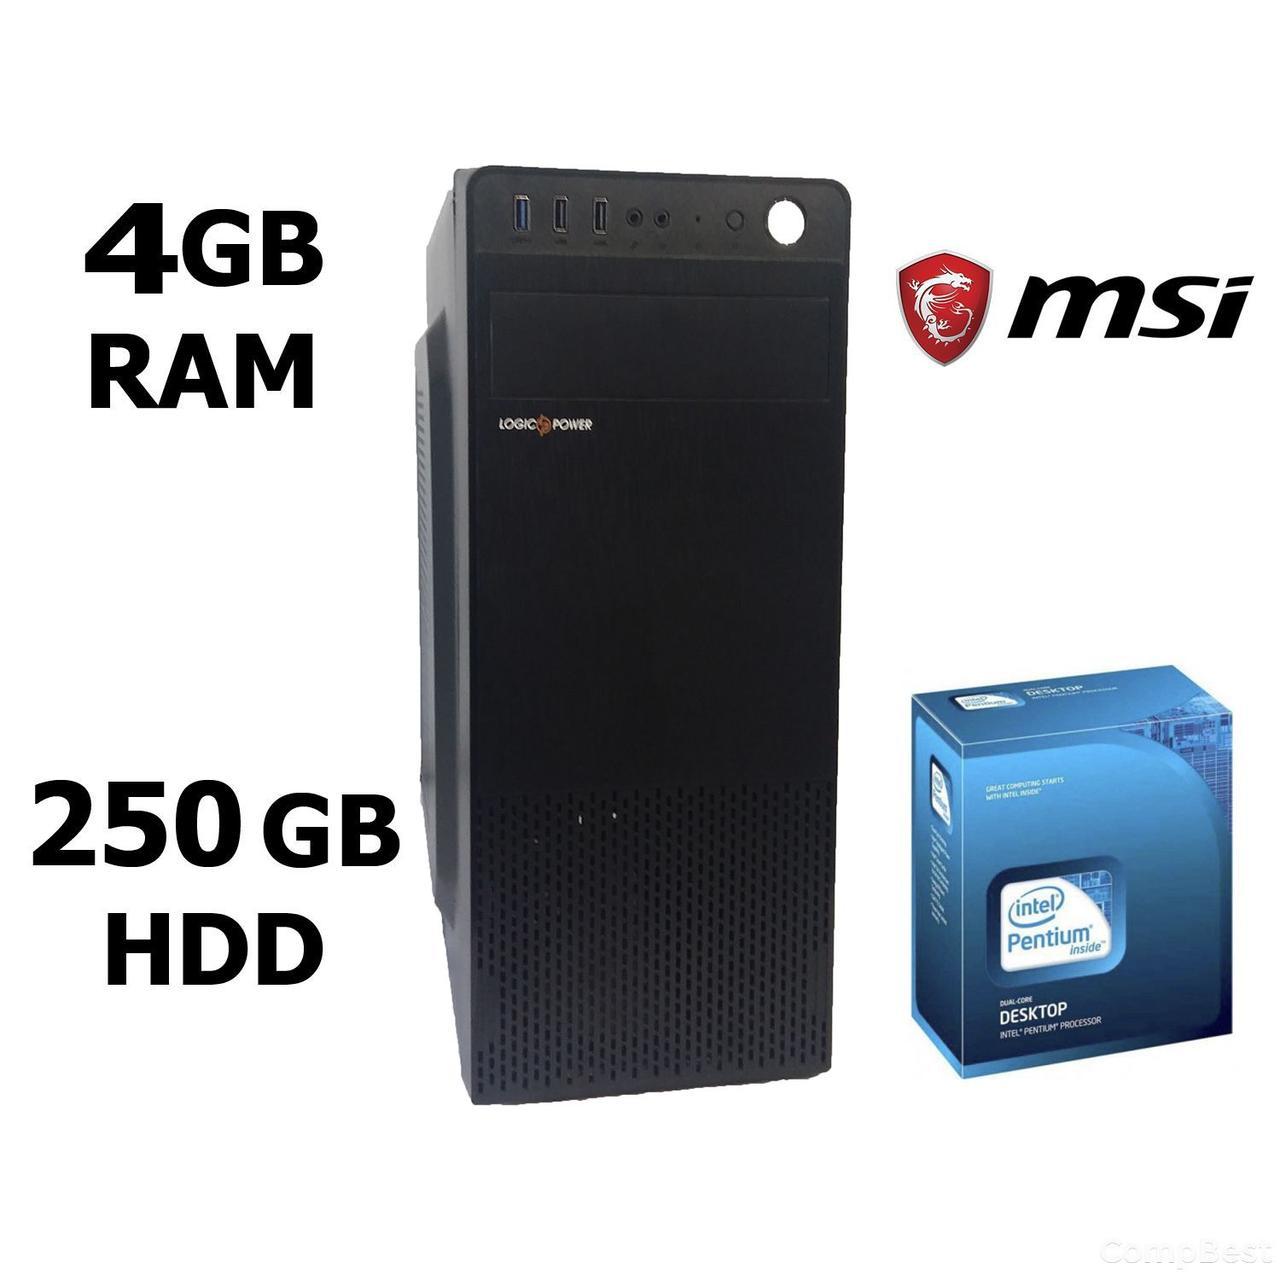 MSI MiniTower / Intel® Pentium® G2030 (2 ядра по 3.00 GHz) / 4 GB DDR3 / 250 GB HDD / Блок питания 400 Ватт